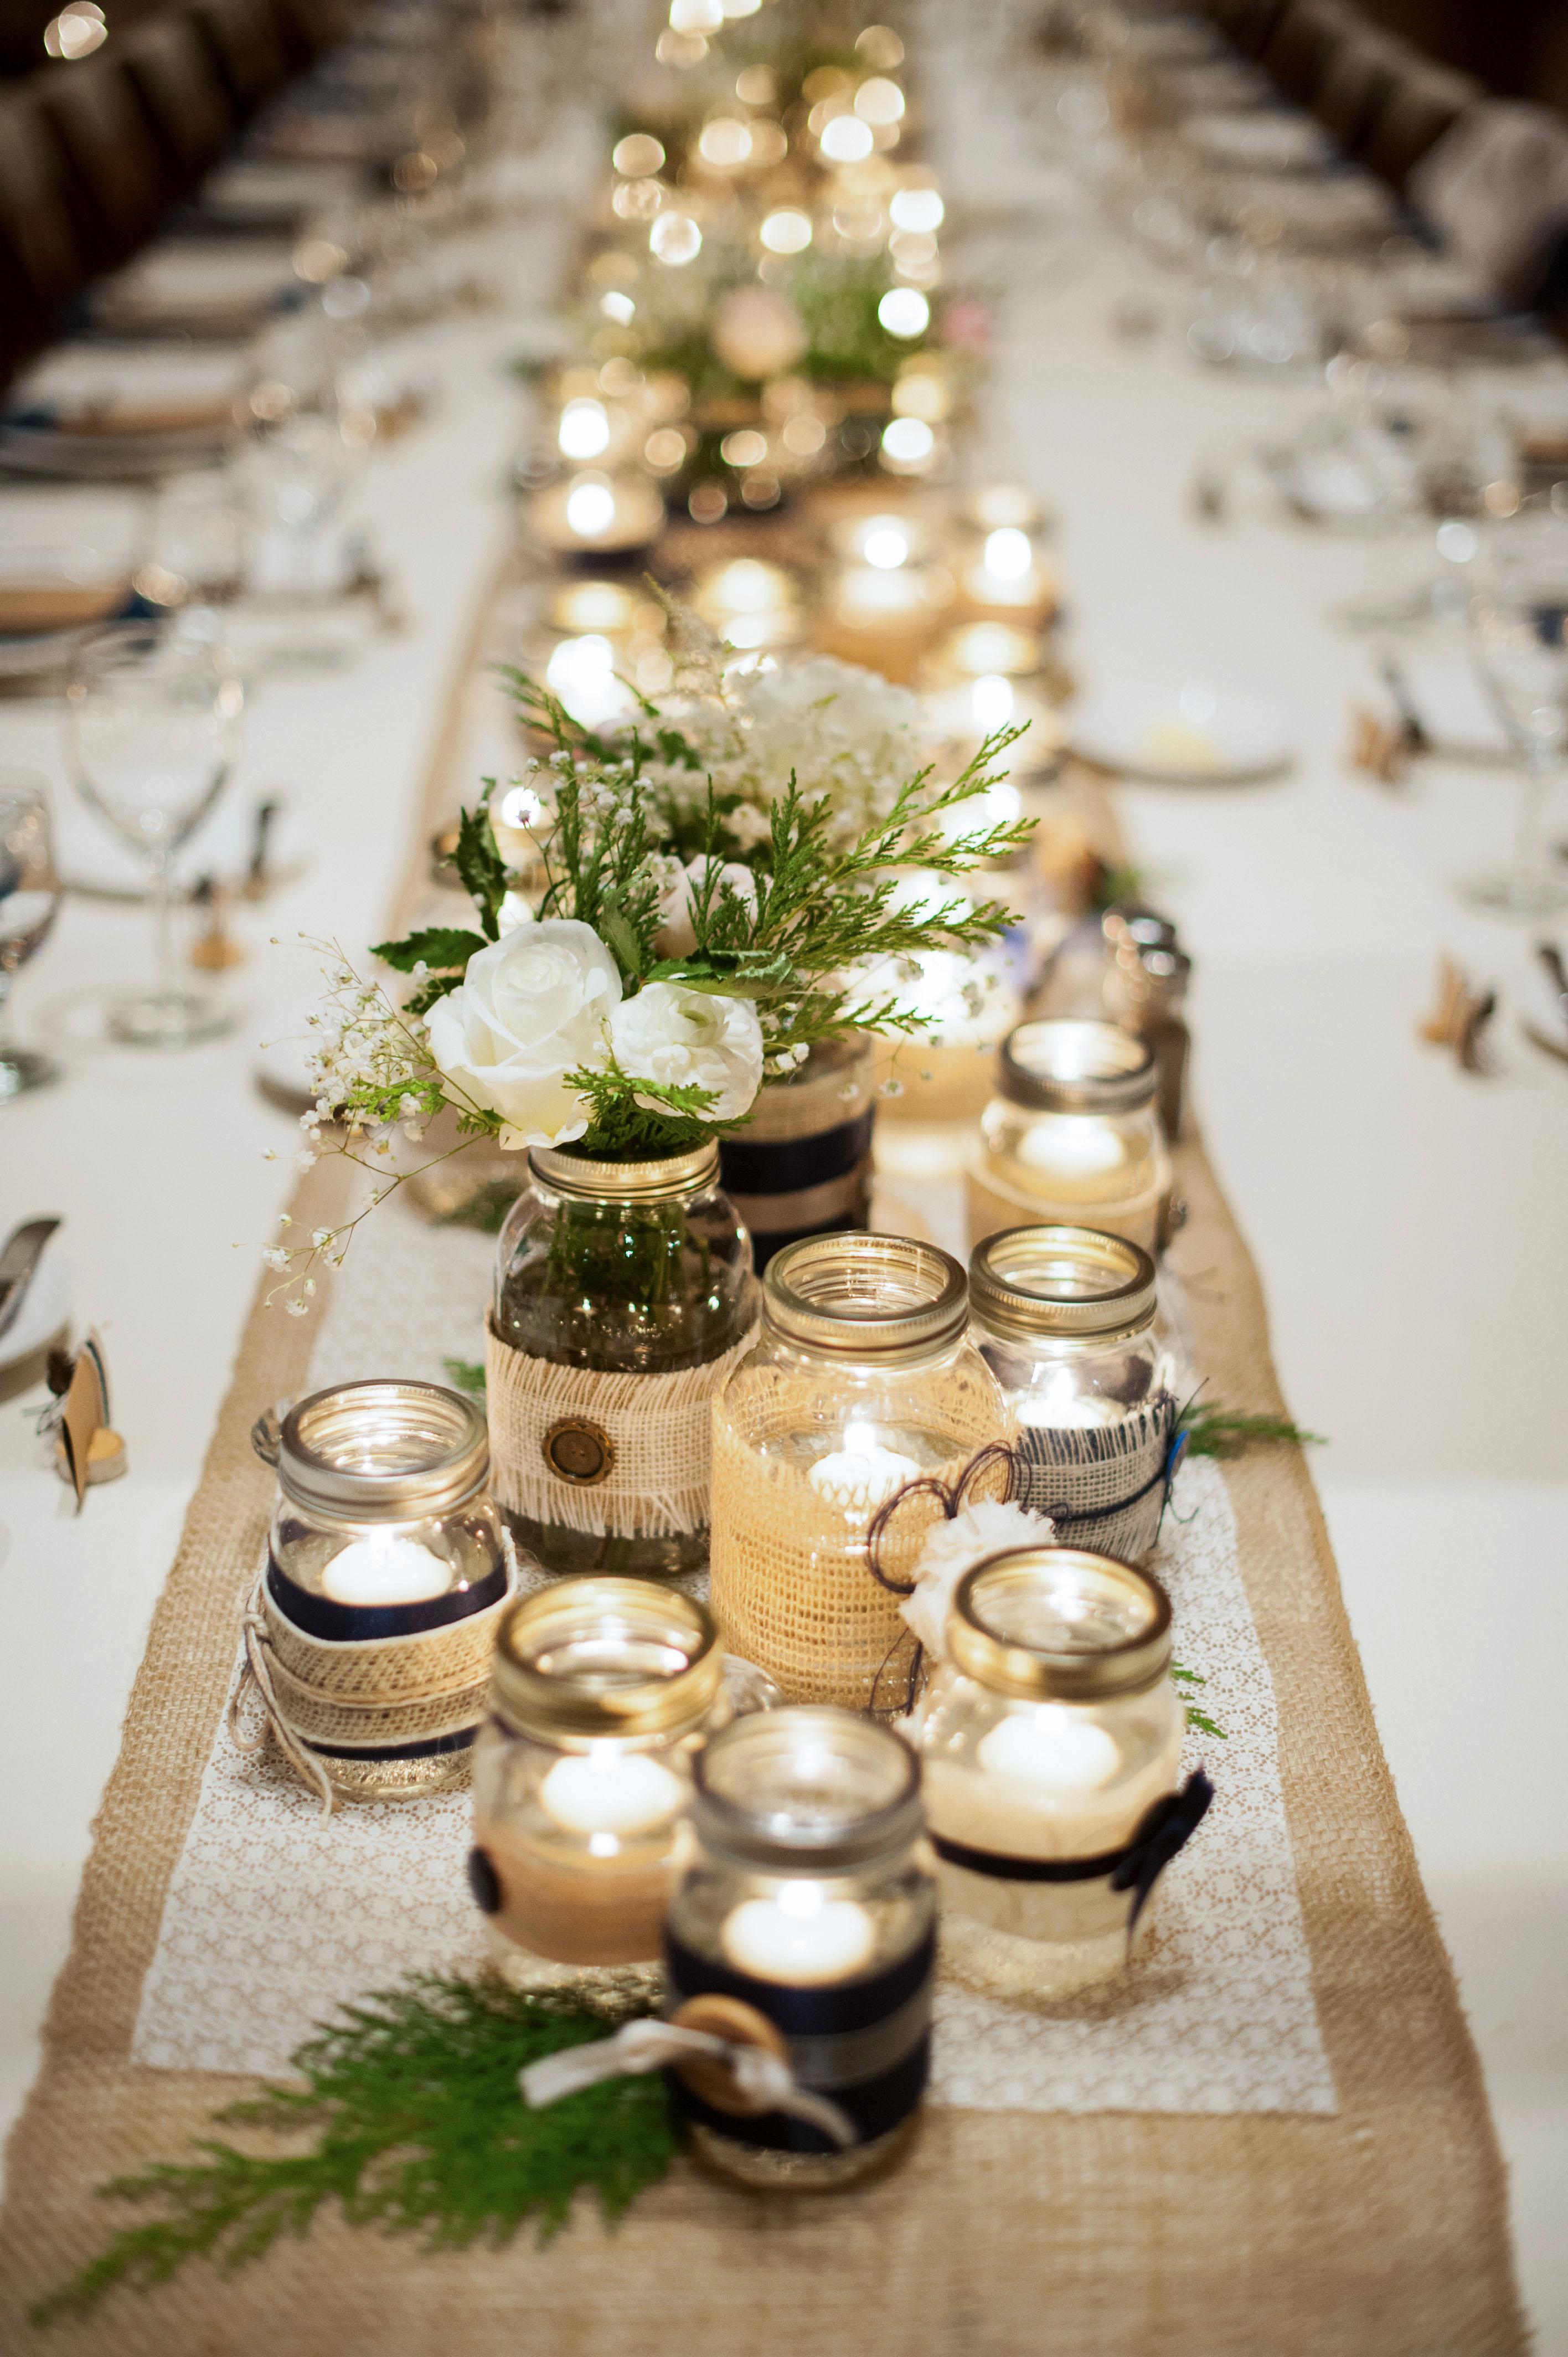 mason jar decor down center of table